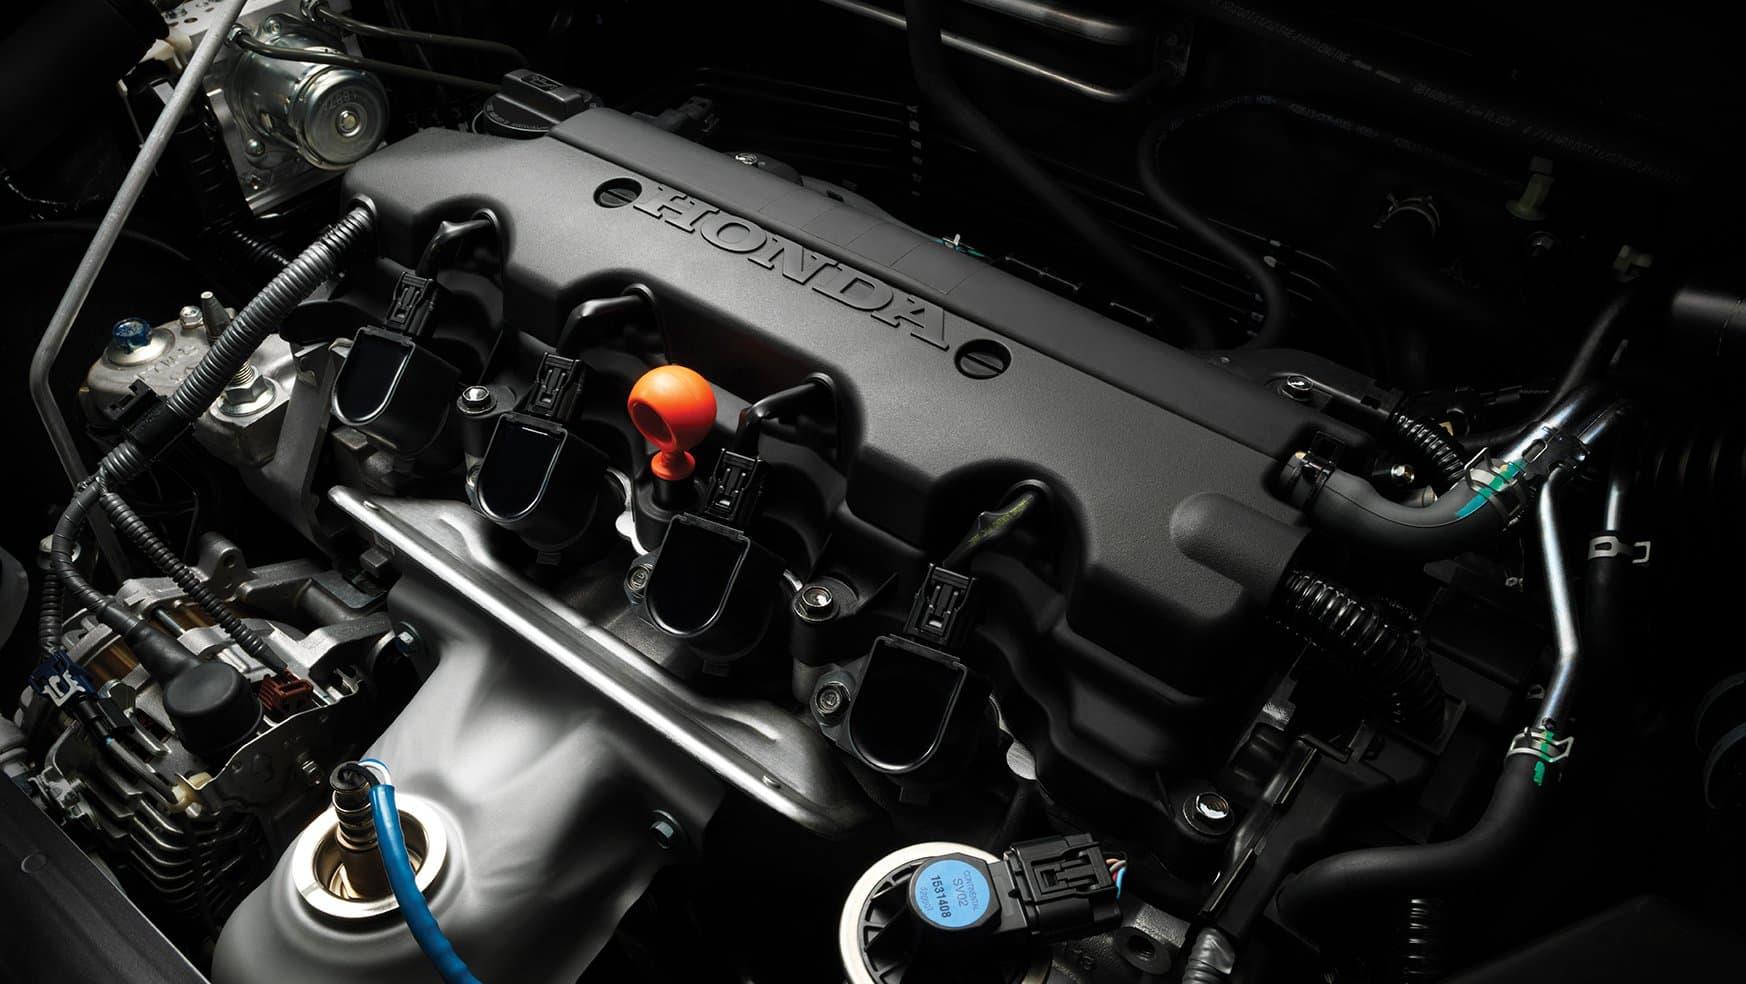 Motor i-VTEC de 4 Cilindros de 1.8 Litros